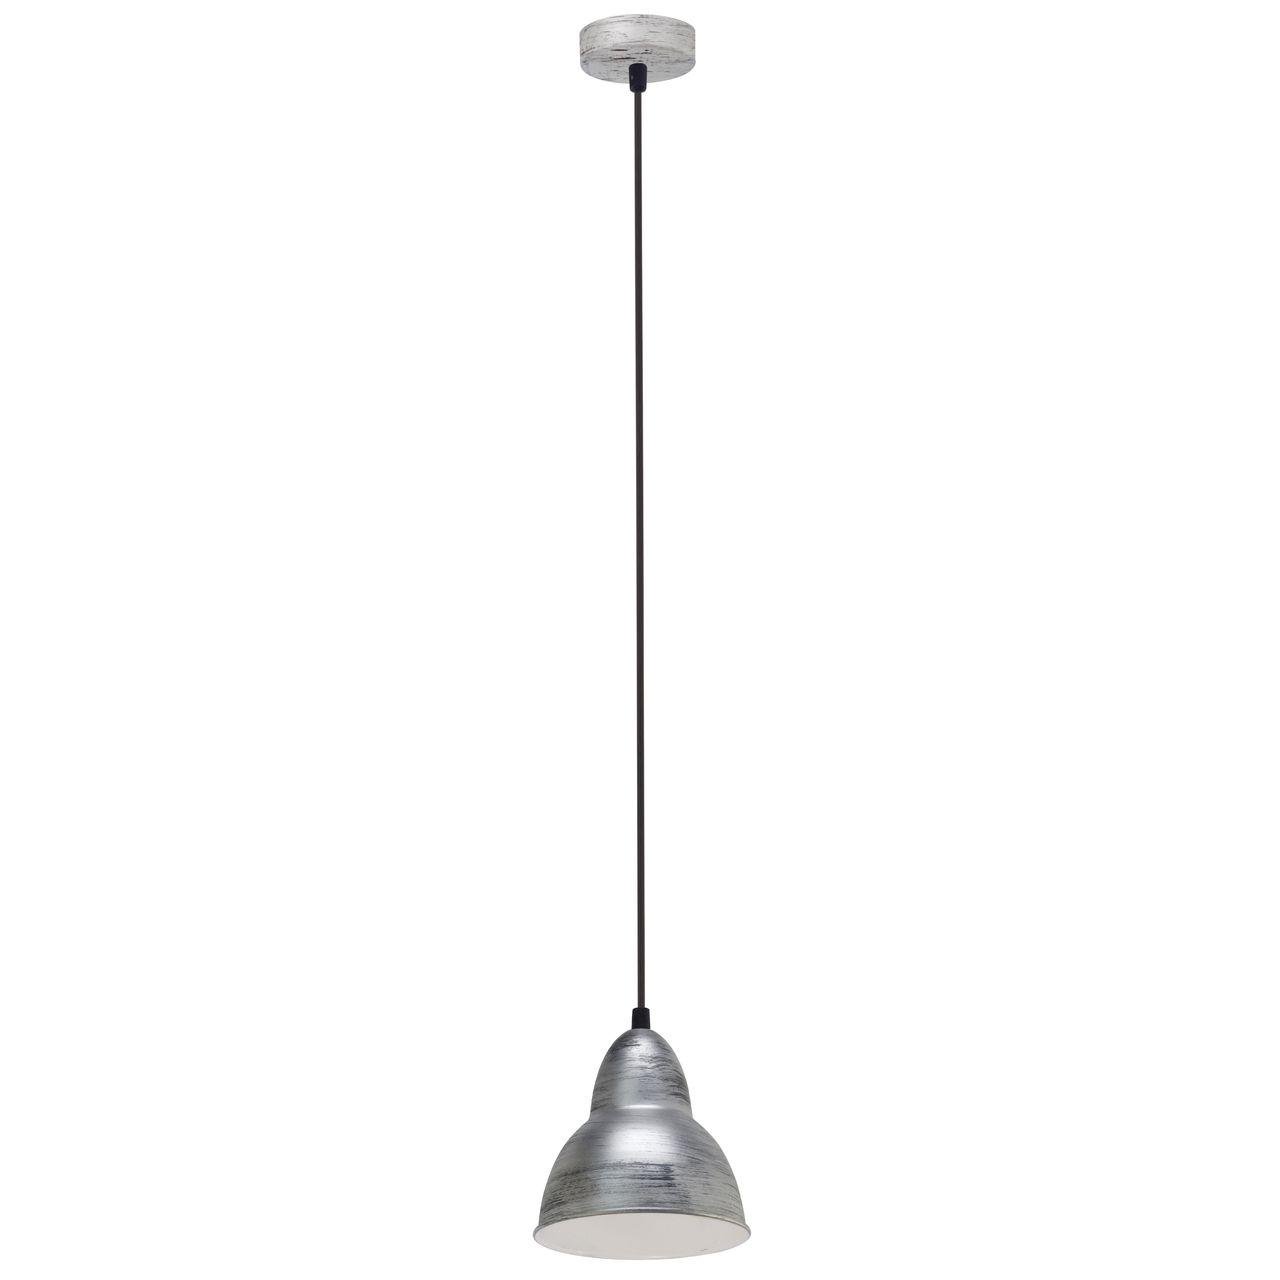 Подвесной светильник Eglo Vintage 49236 абажур eglo vintage 49659